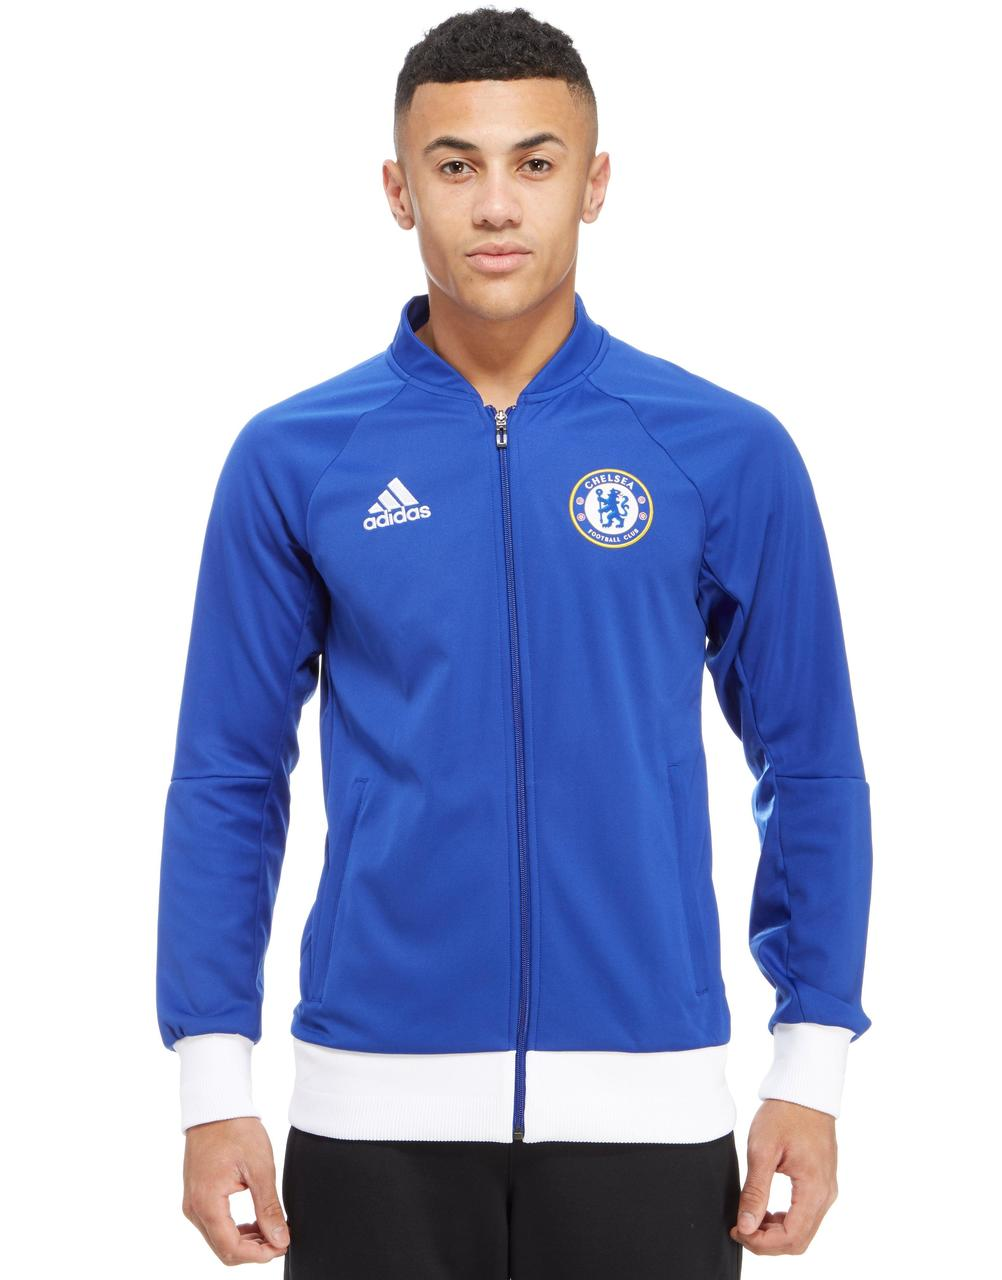 48110dbf3f41 Adidas Chelsea FC 2016 17 Anthem Jacket - Chelsea Blue   White ...